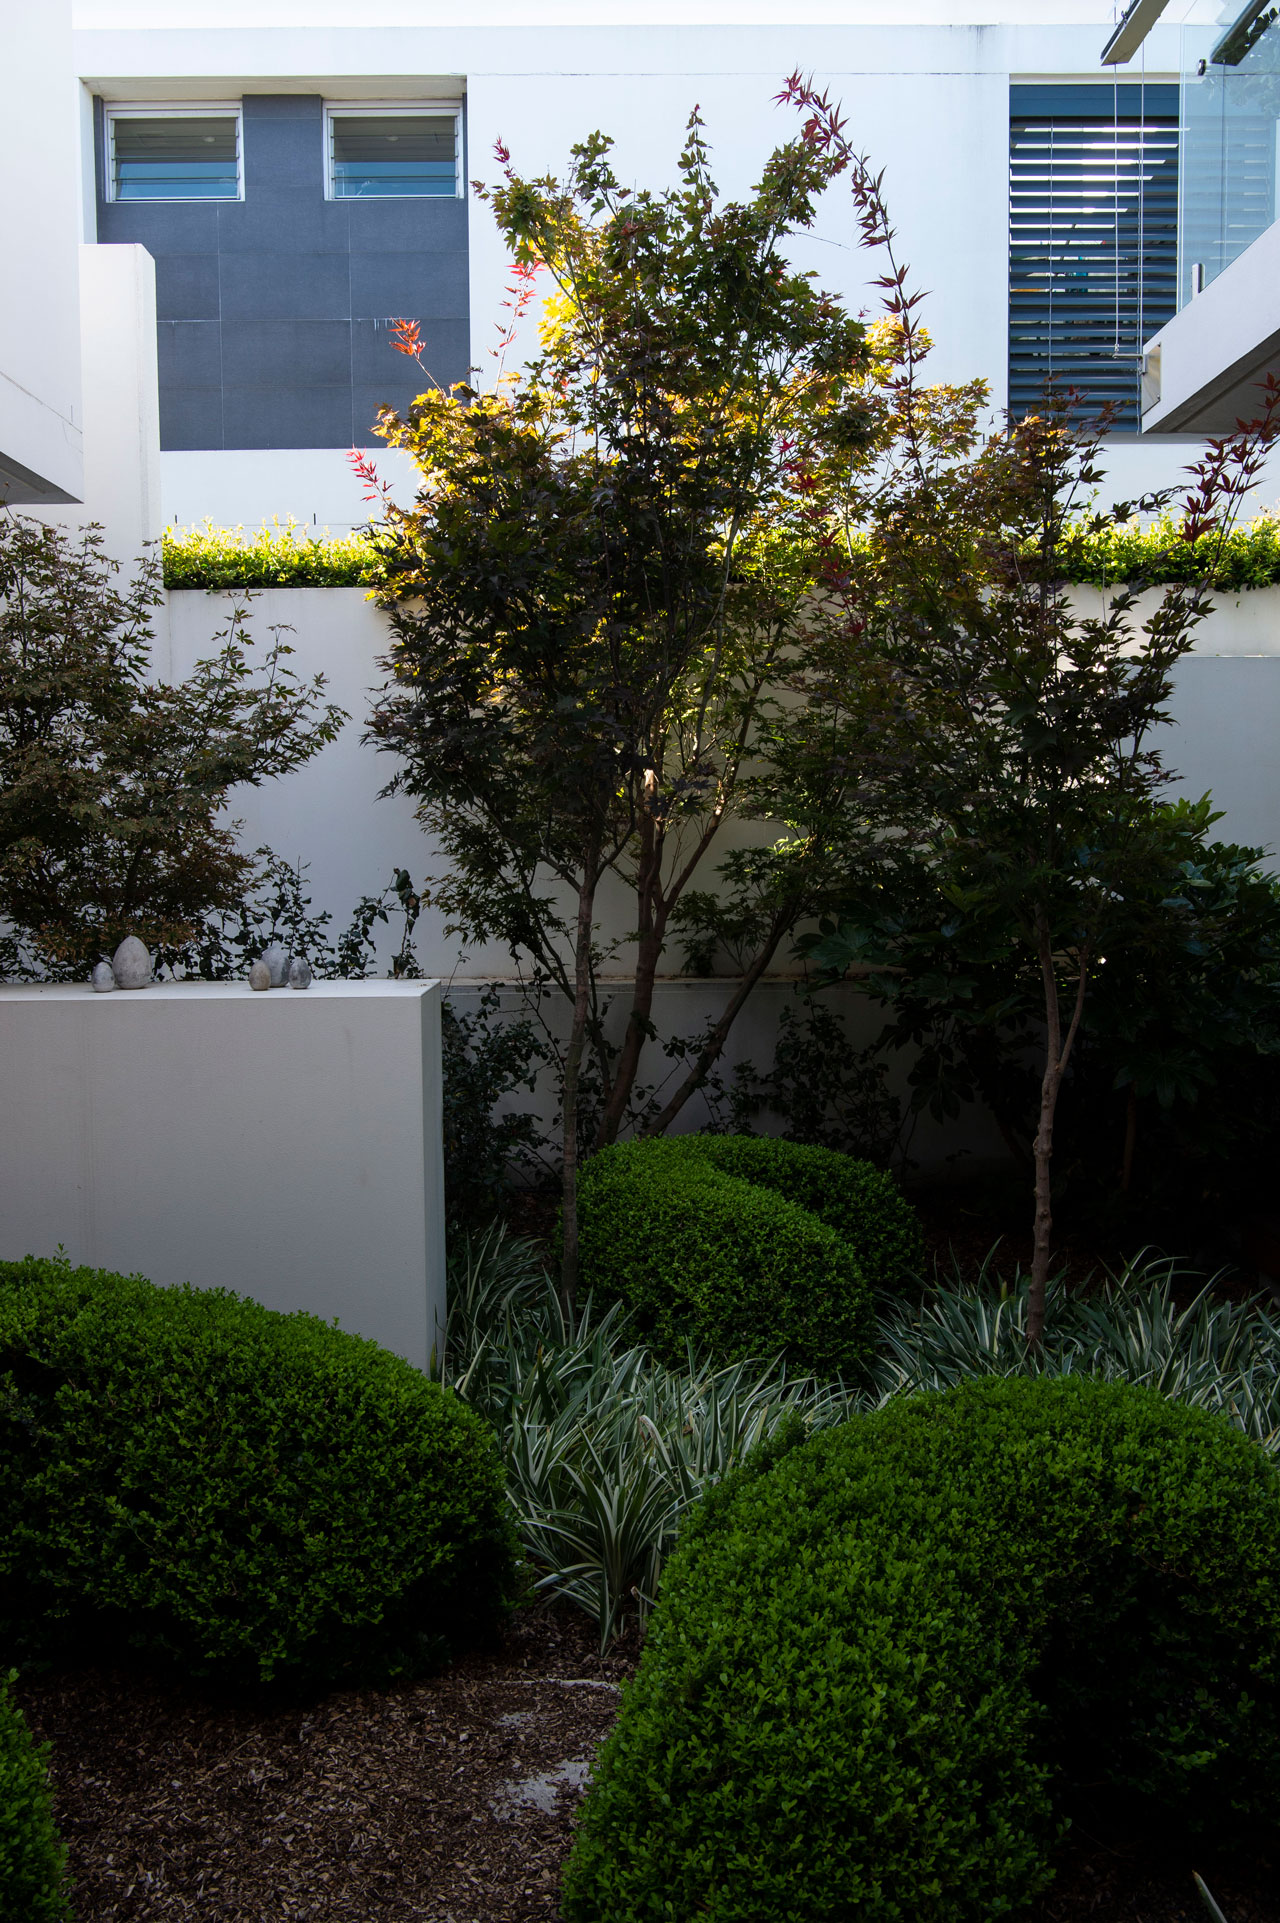 Catt - Mosman Urban Garden - Michael Cooke Garden Design